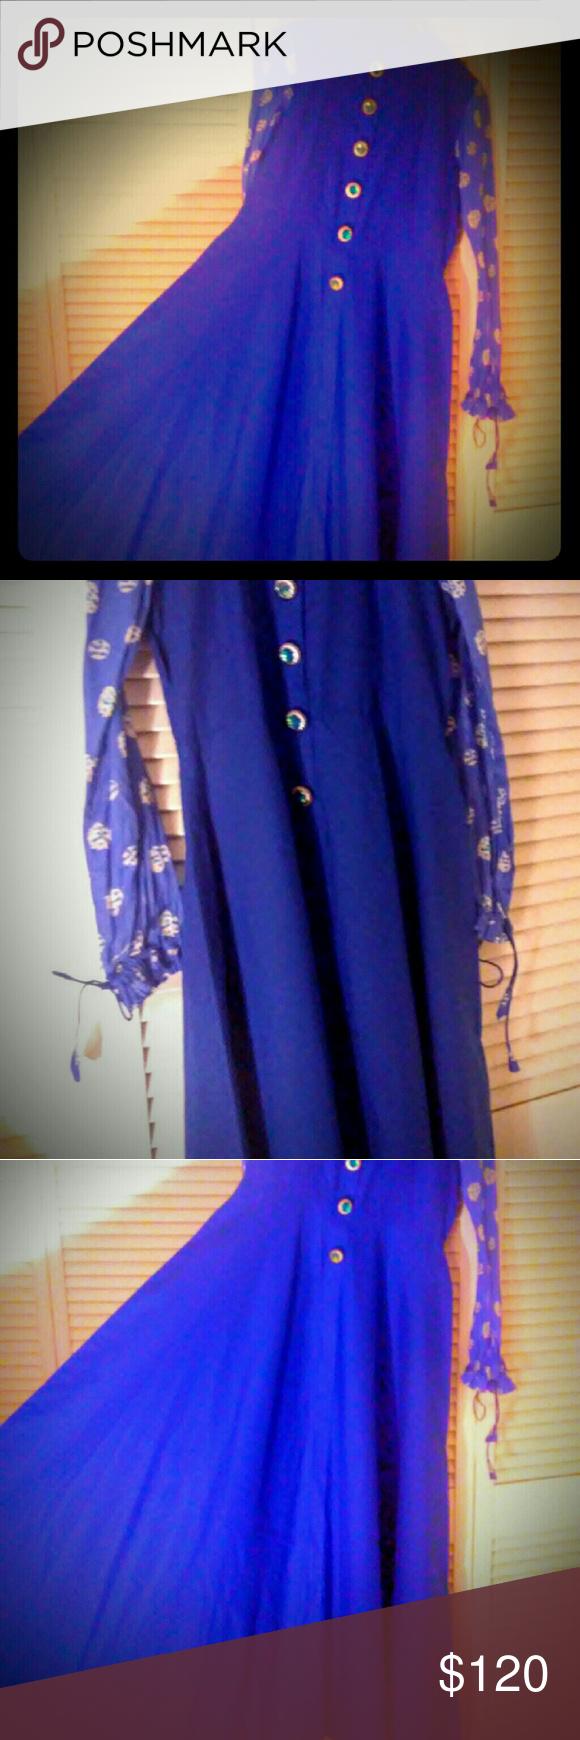 Royal blue vintage style cotton dress royal blue vintage